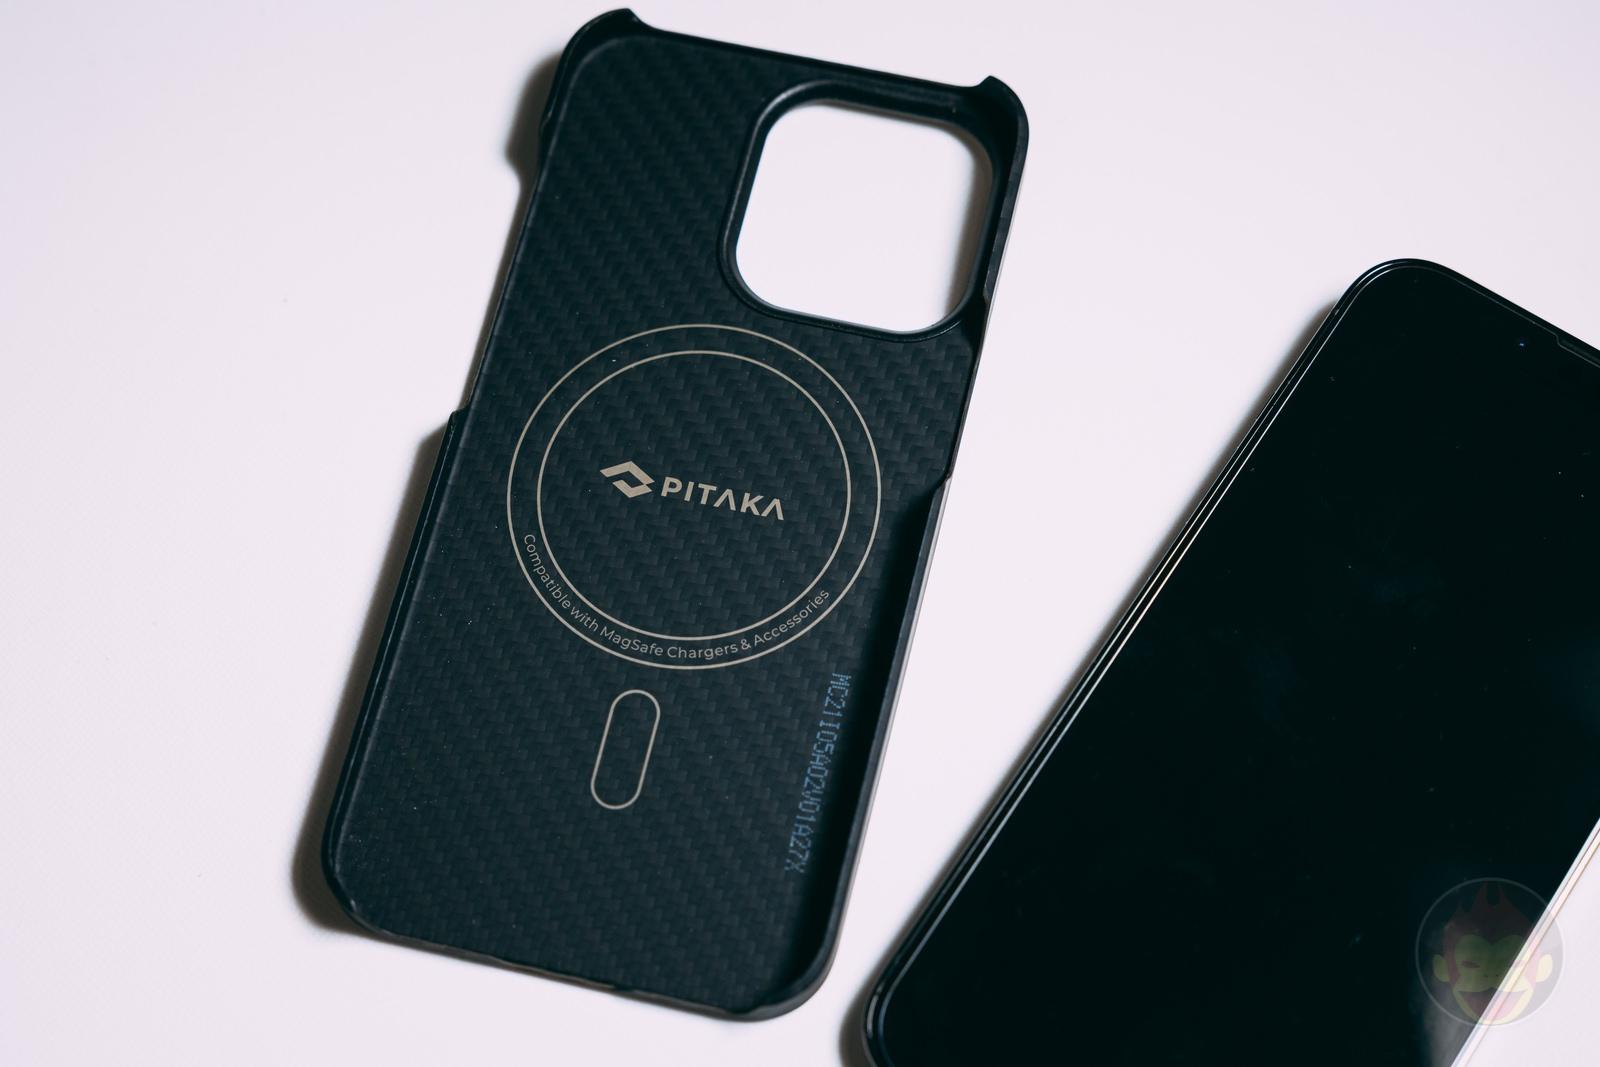 PITAKA MagSafe Compatible Case Review 10